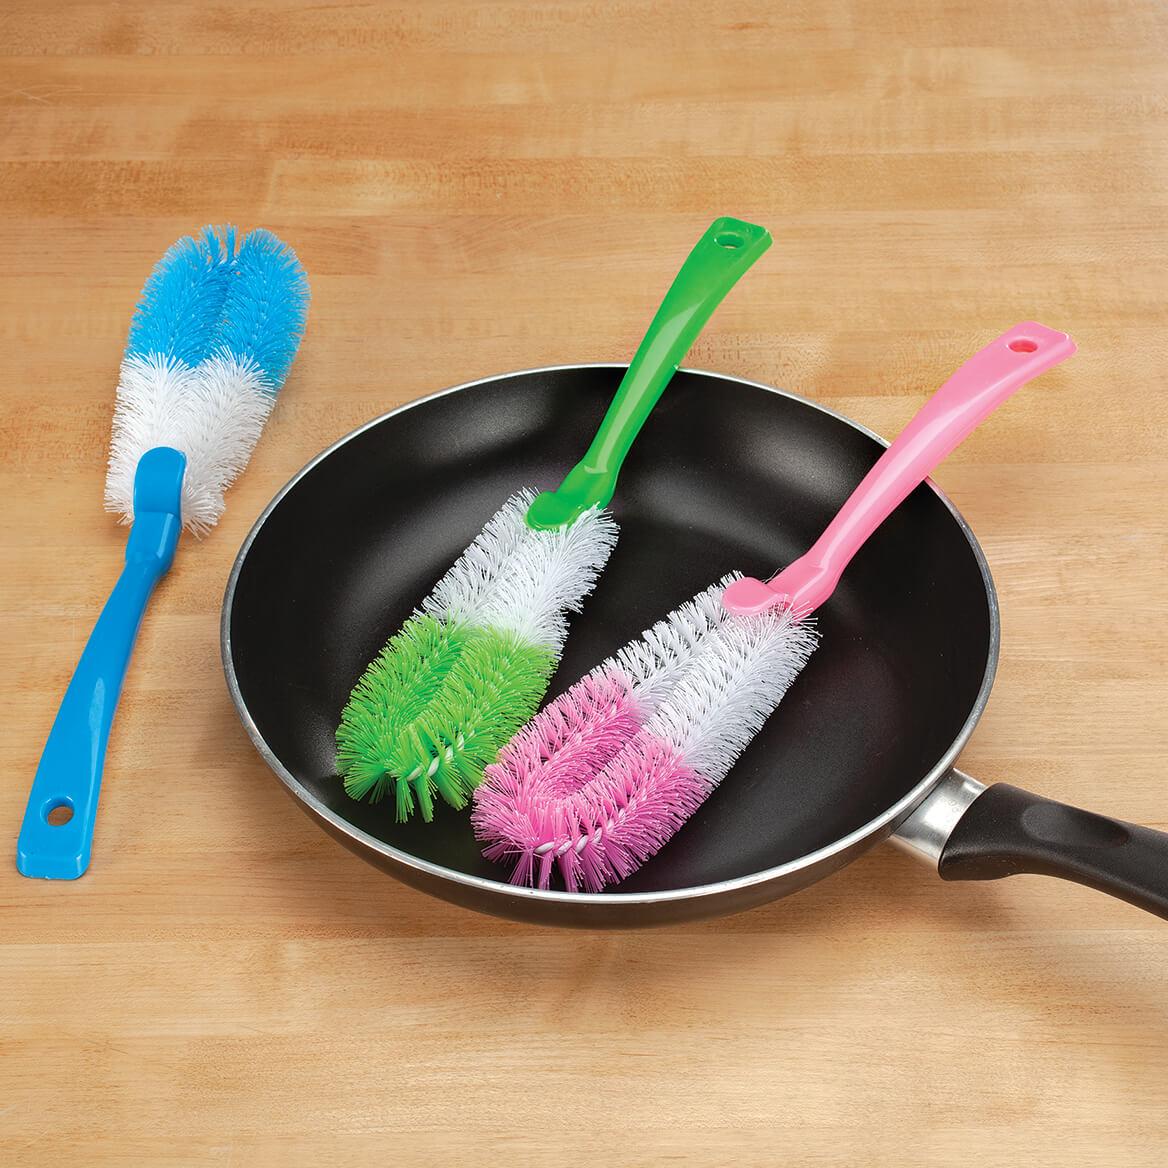 3-in-1 Blender, Bottle & Cup Cleaning Brush, Set of 3-370751